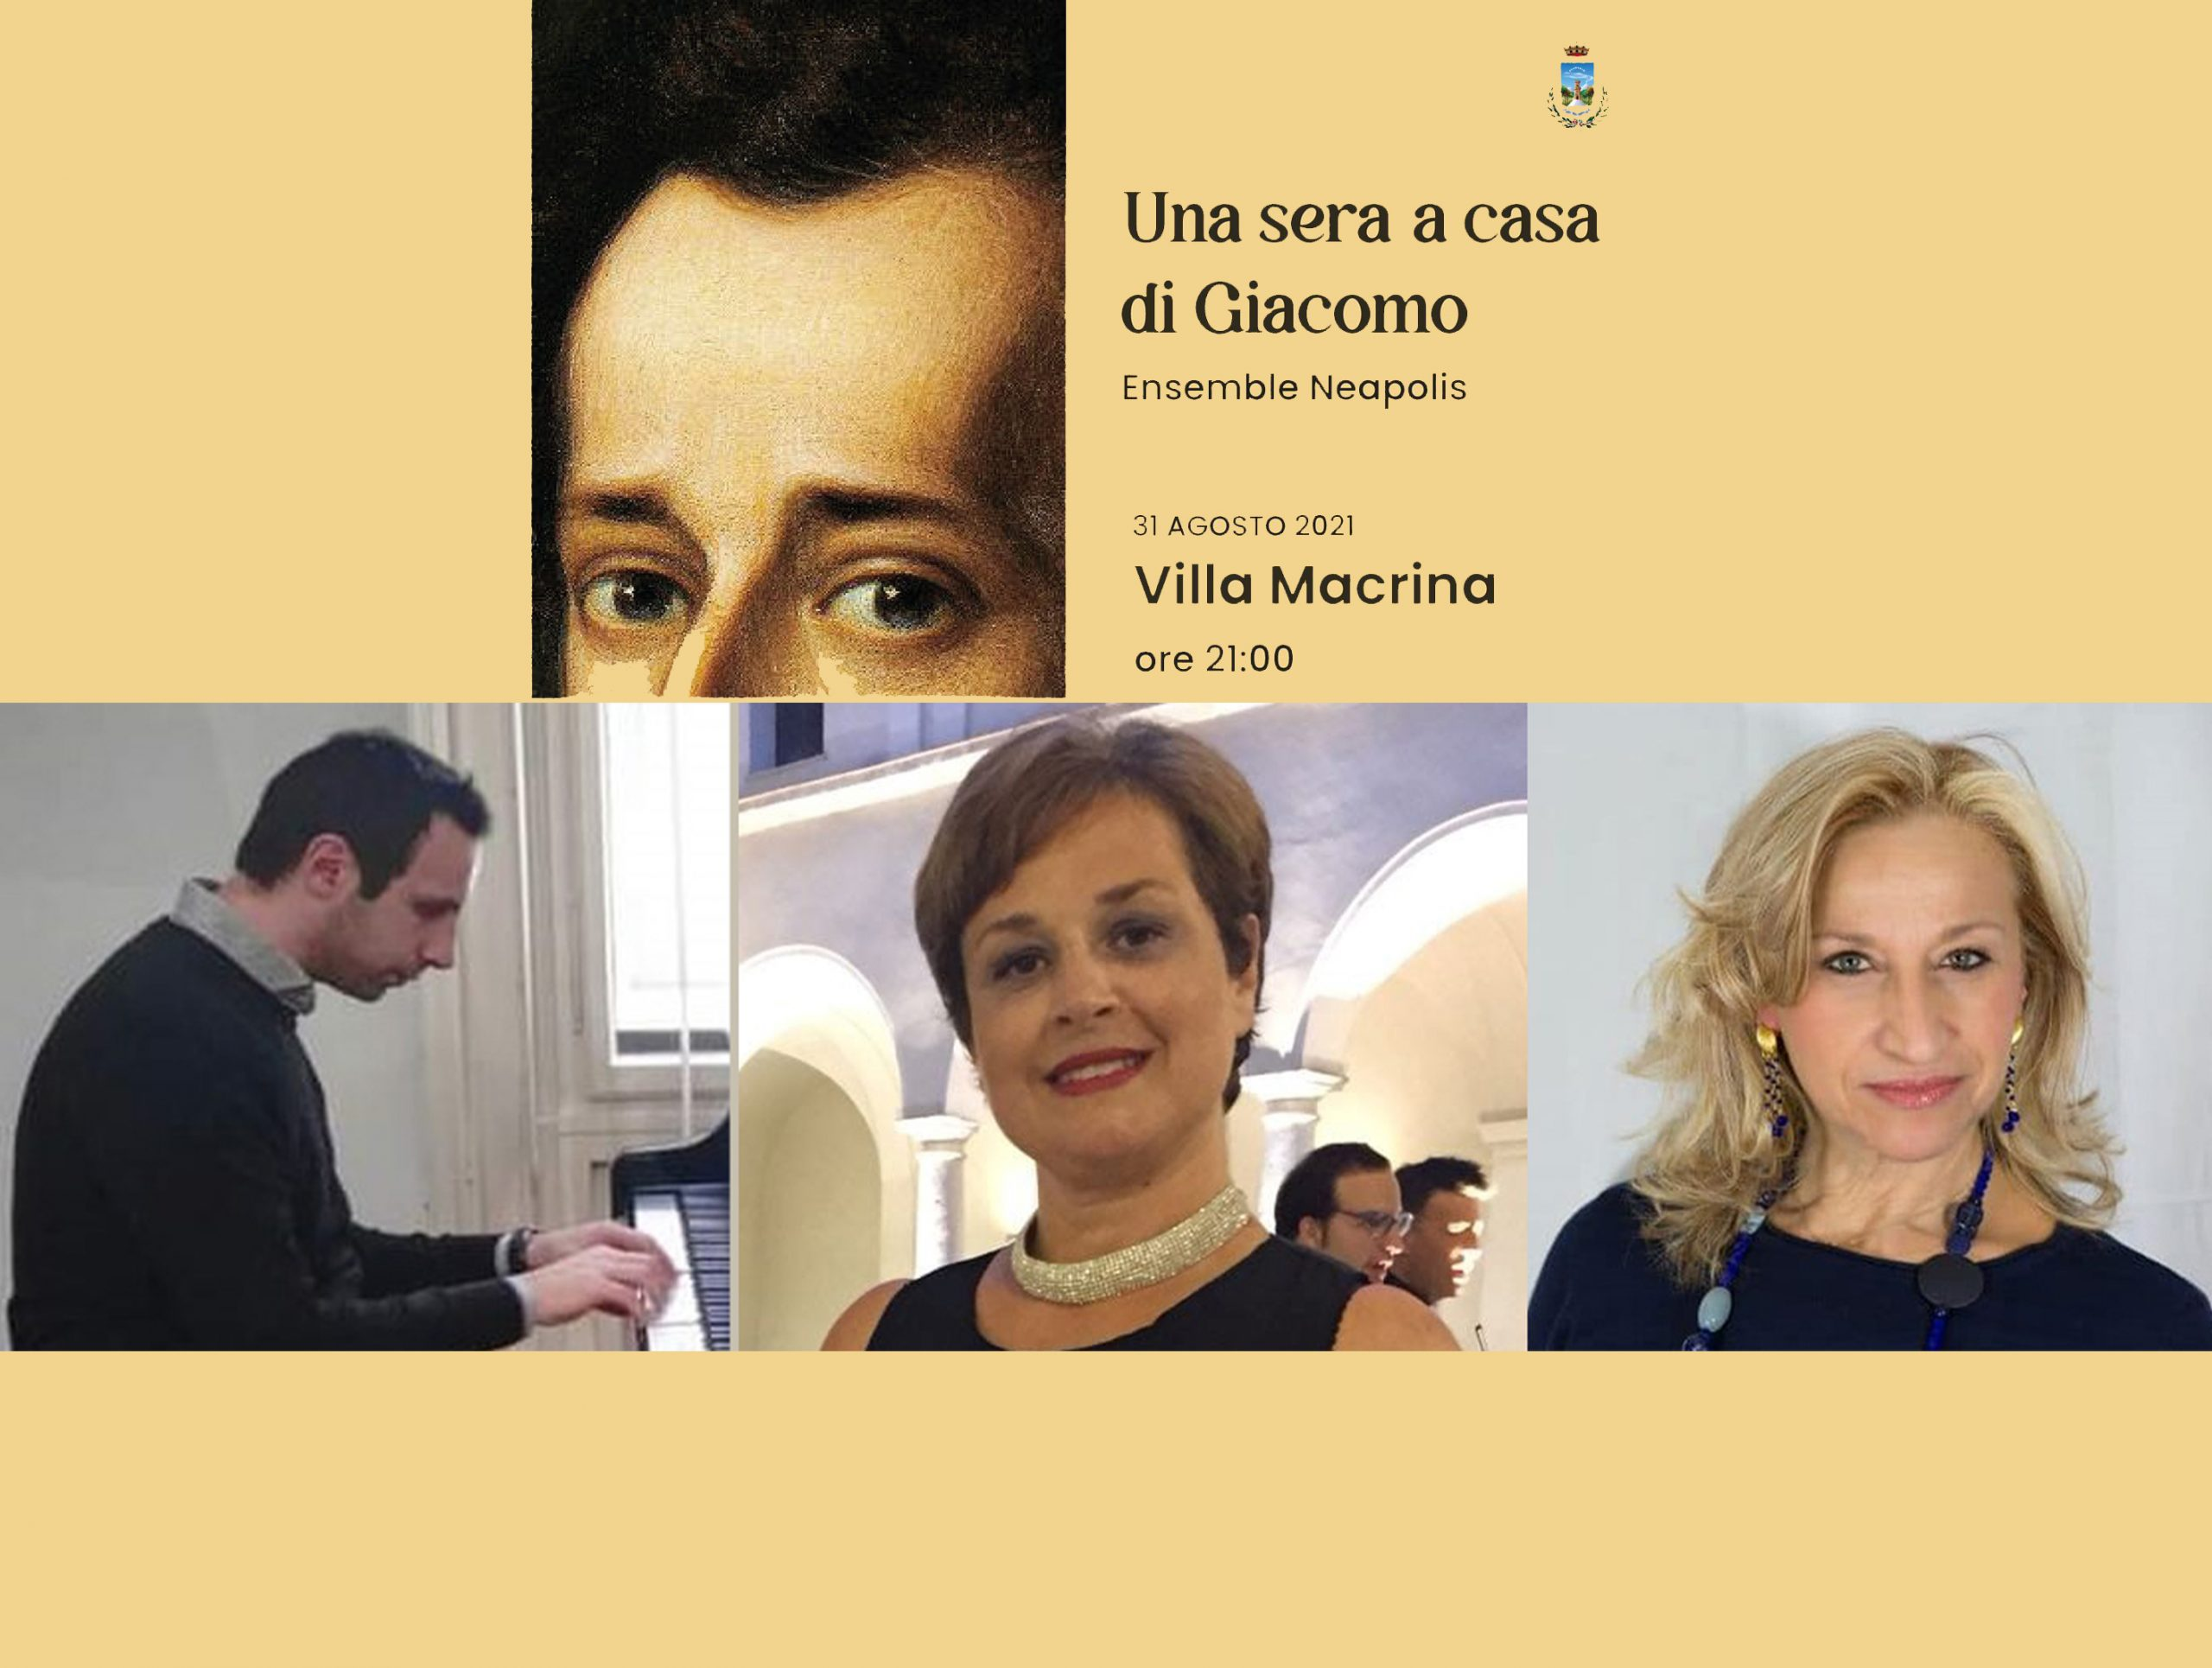 A casa di Giacomo: serata di canto, musica e poesia con il trio Ensamble Neapolis